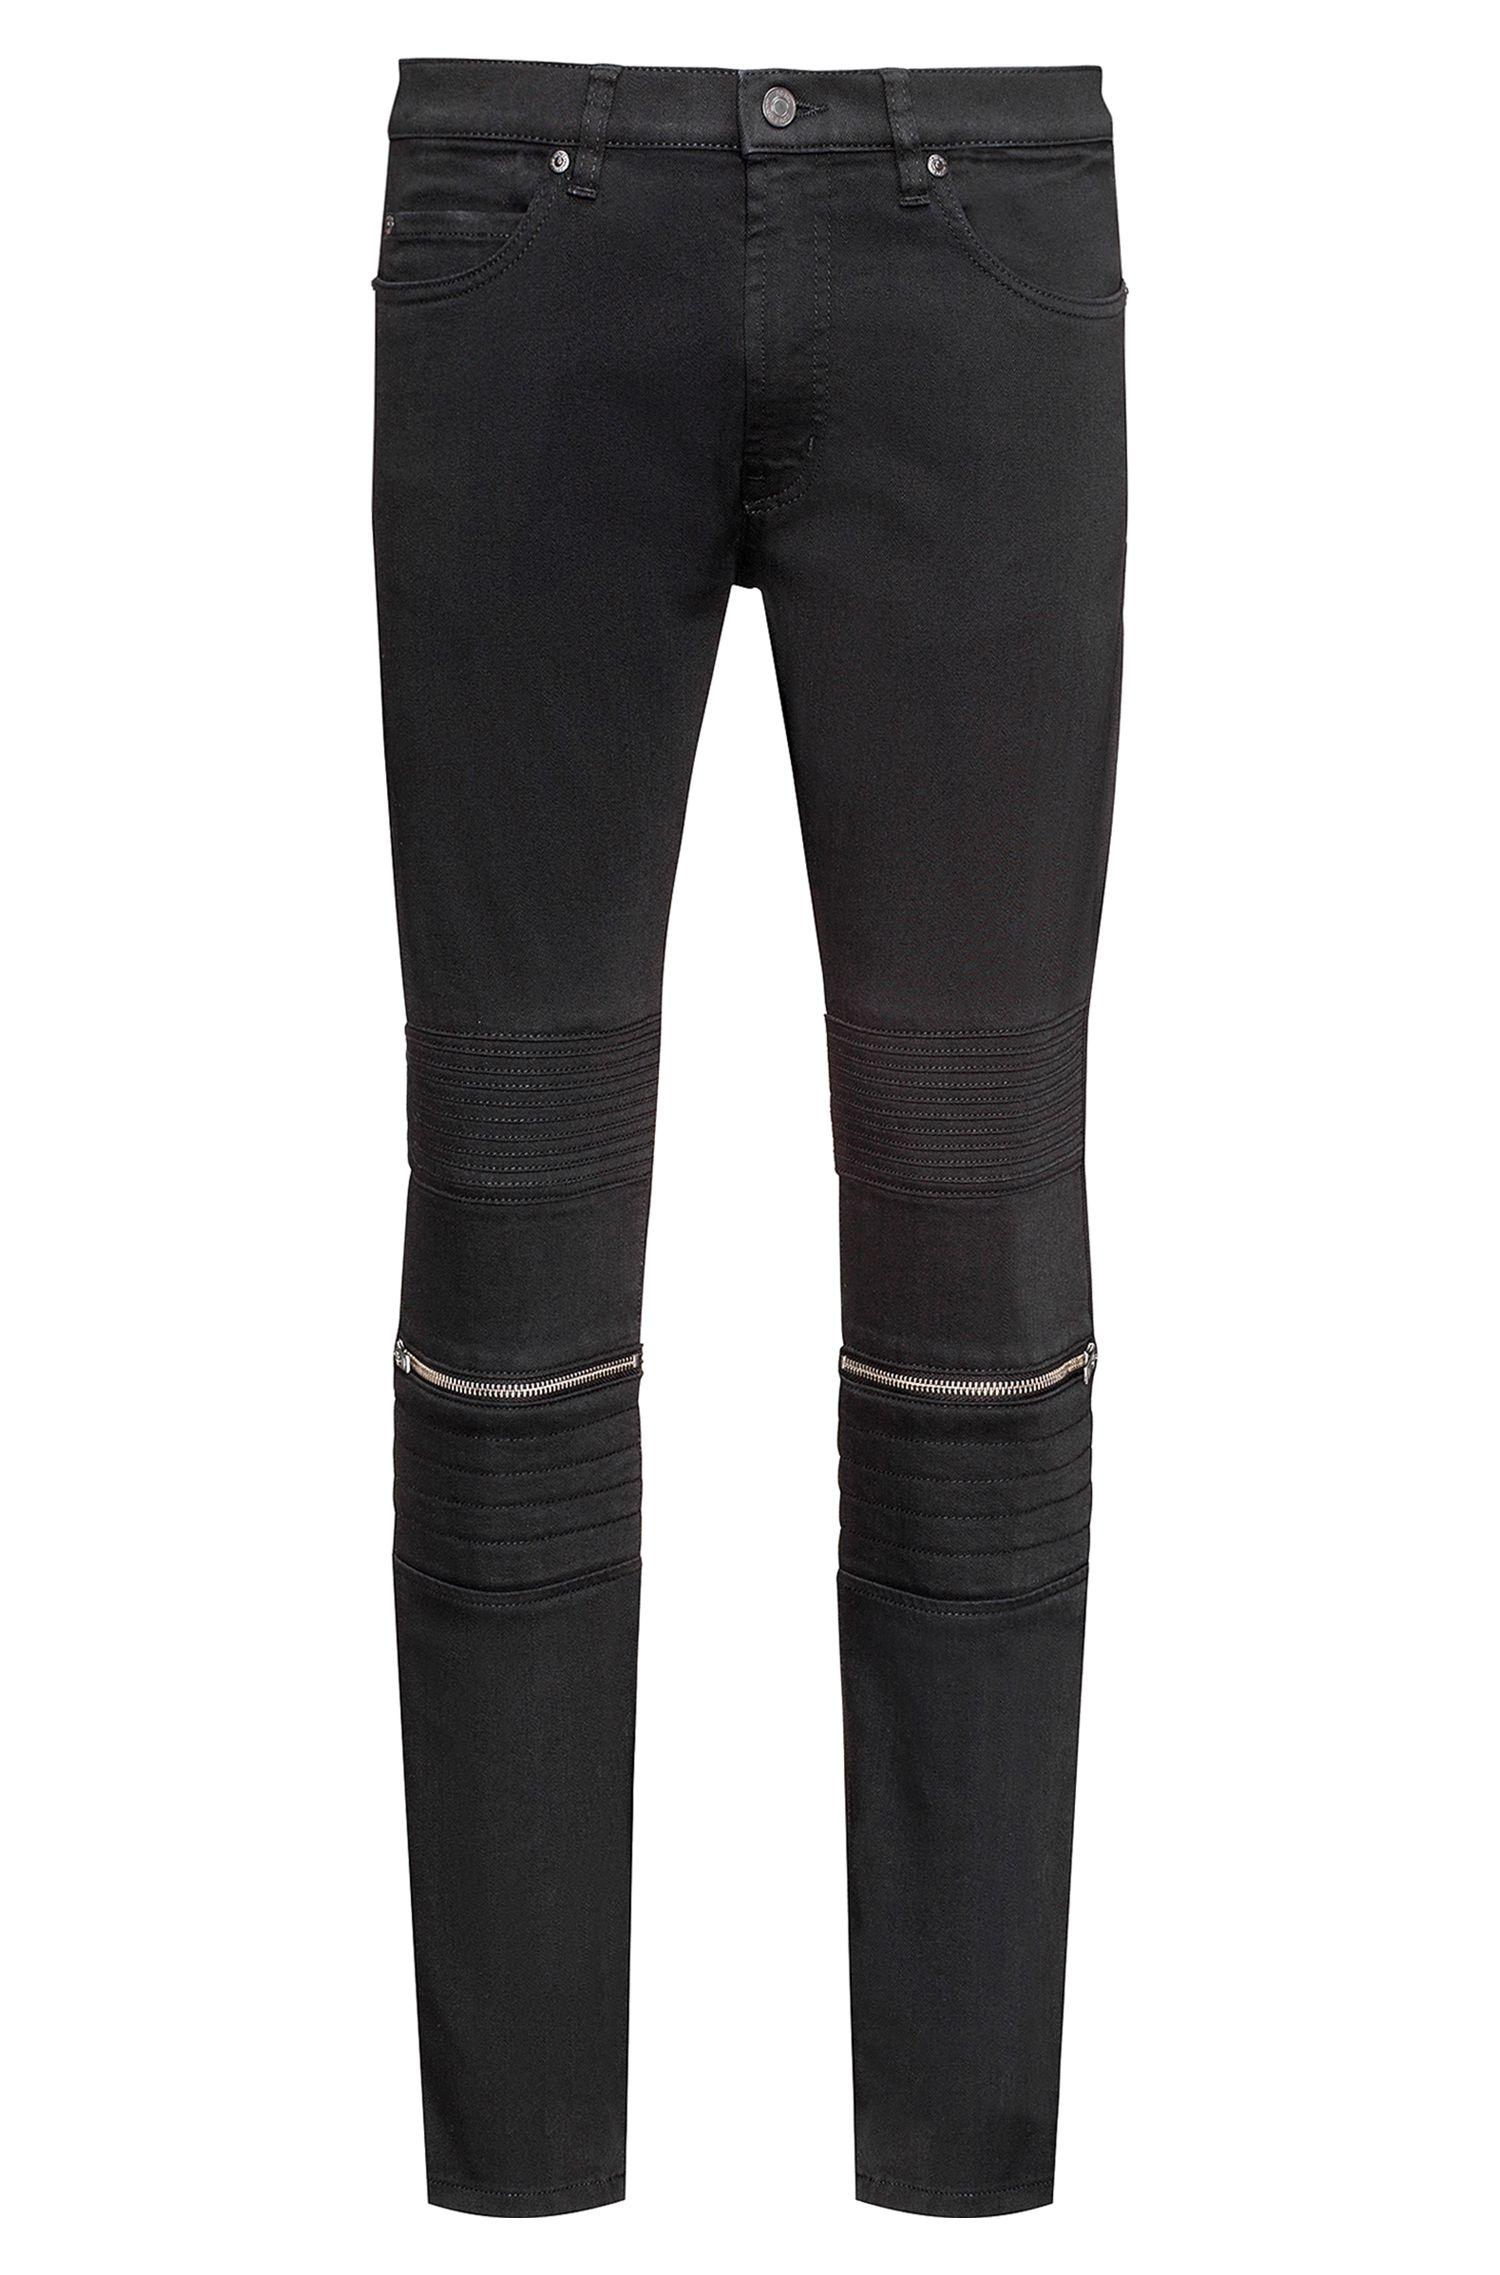 Skinny-Fit Jeans aus Stretch-Denim mit Biker-Details